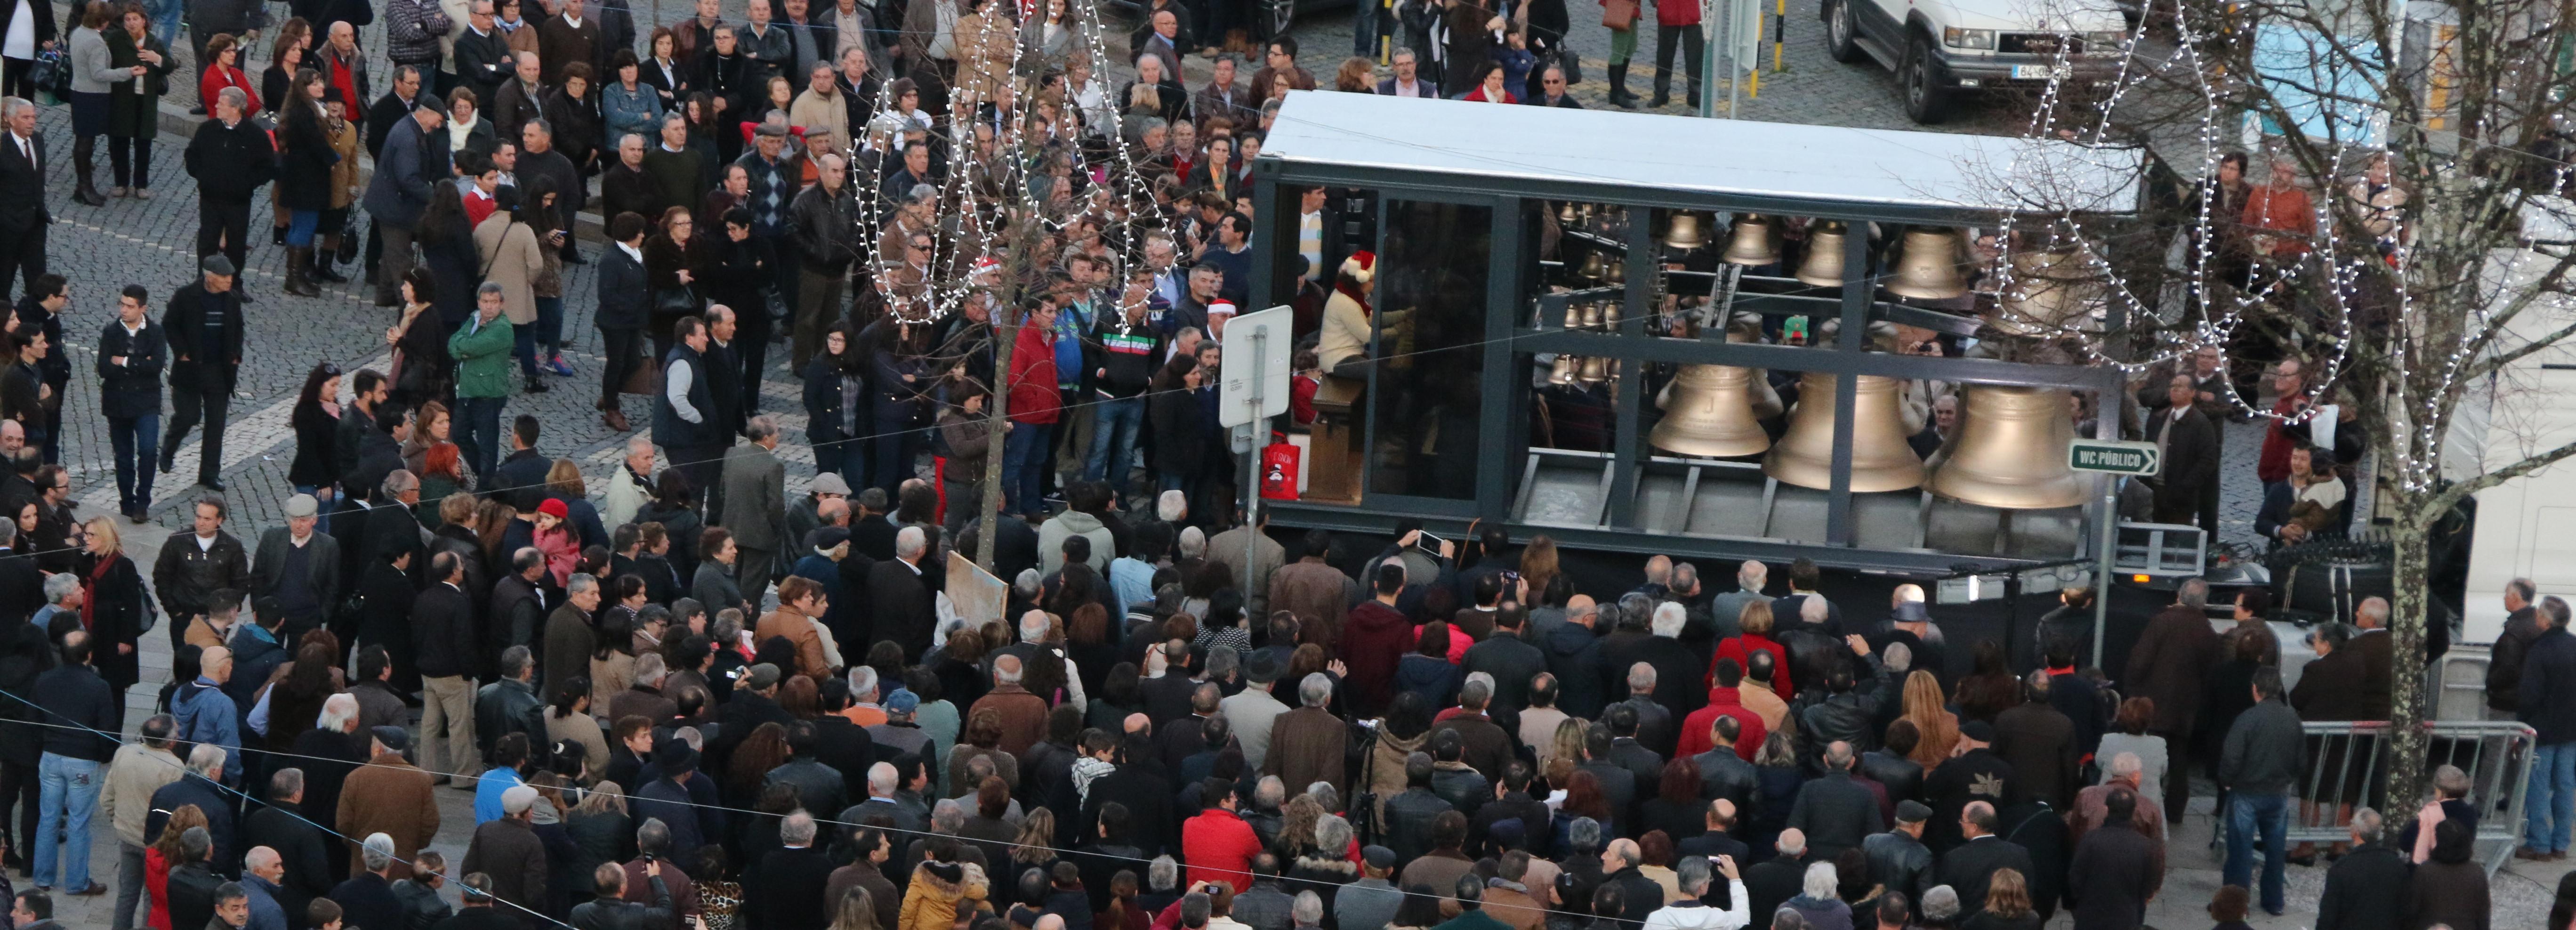 O Centro da Cidade de Barcelos vestiu-se a rigor para receber o Pai Natal